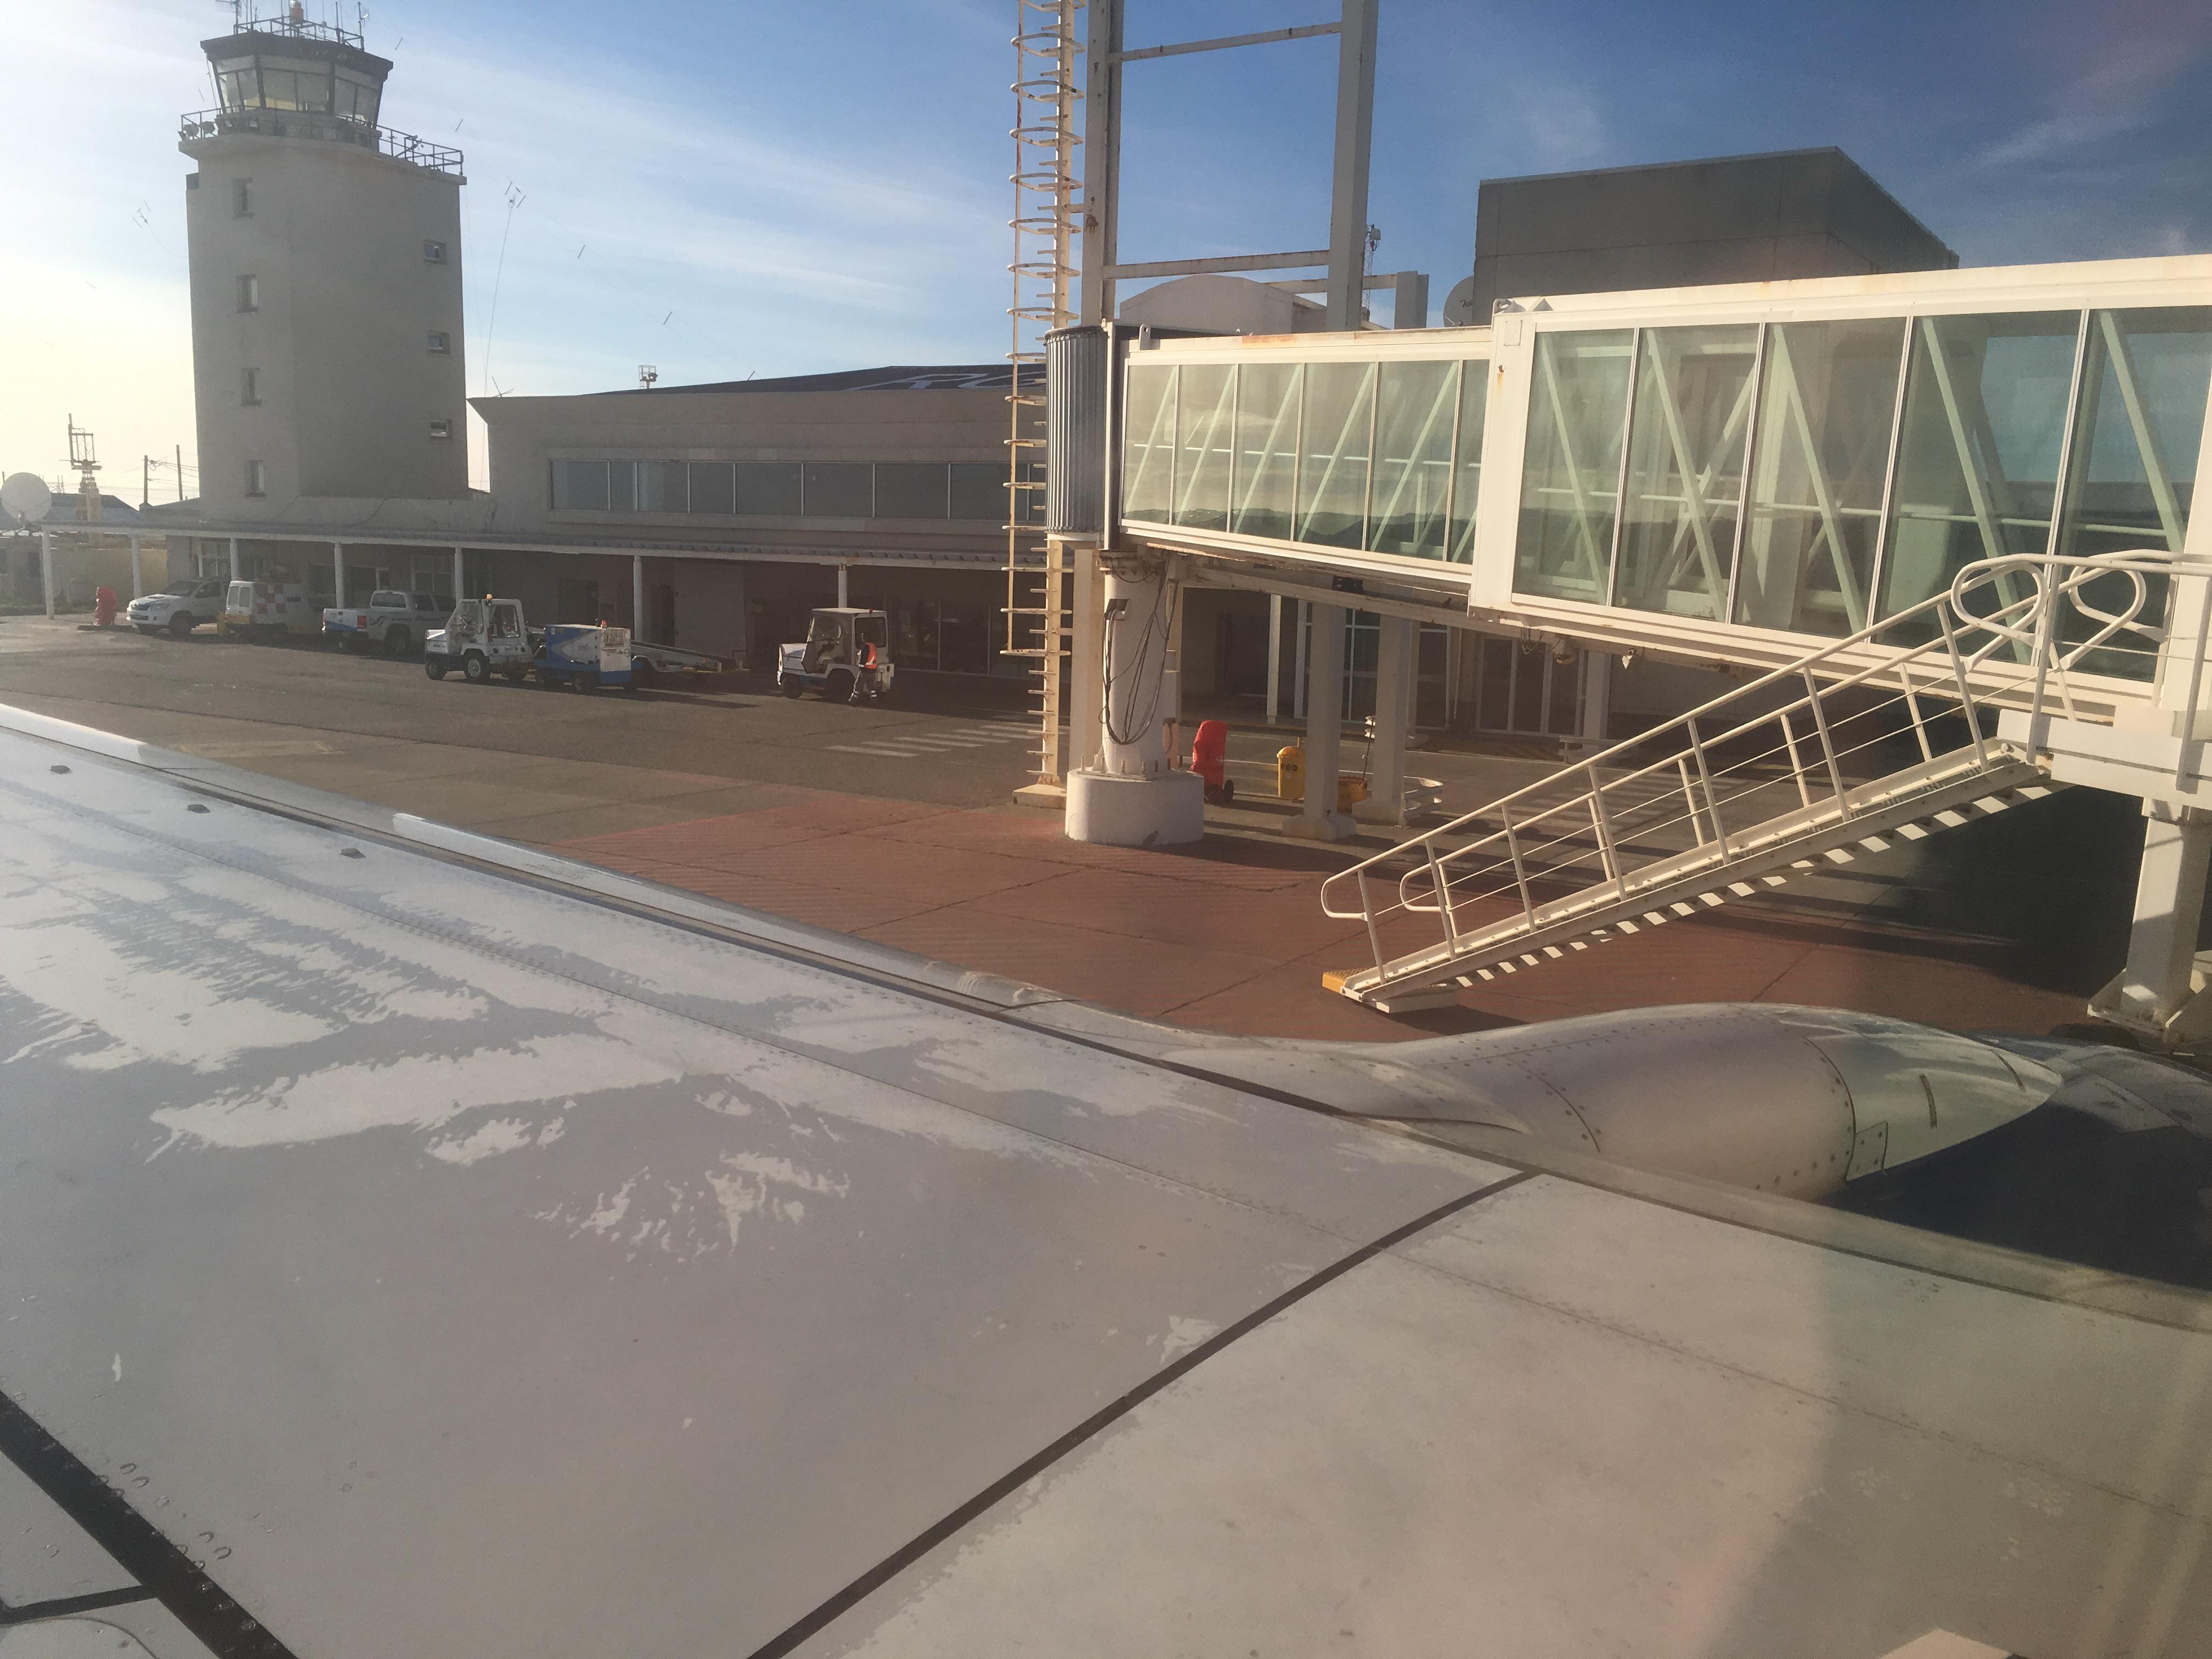 aeropuerto rg2